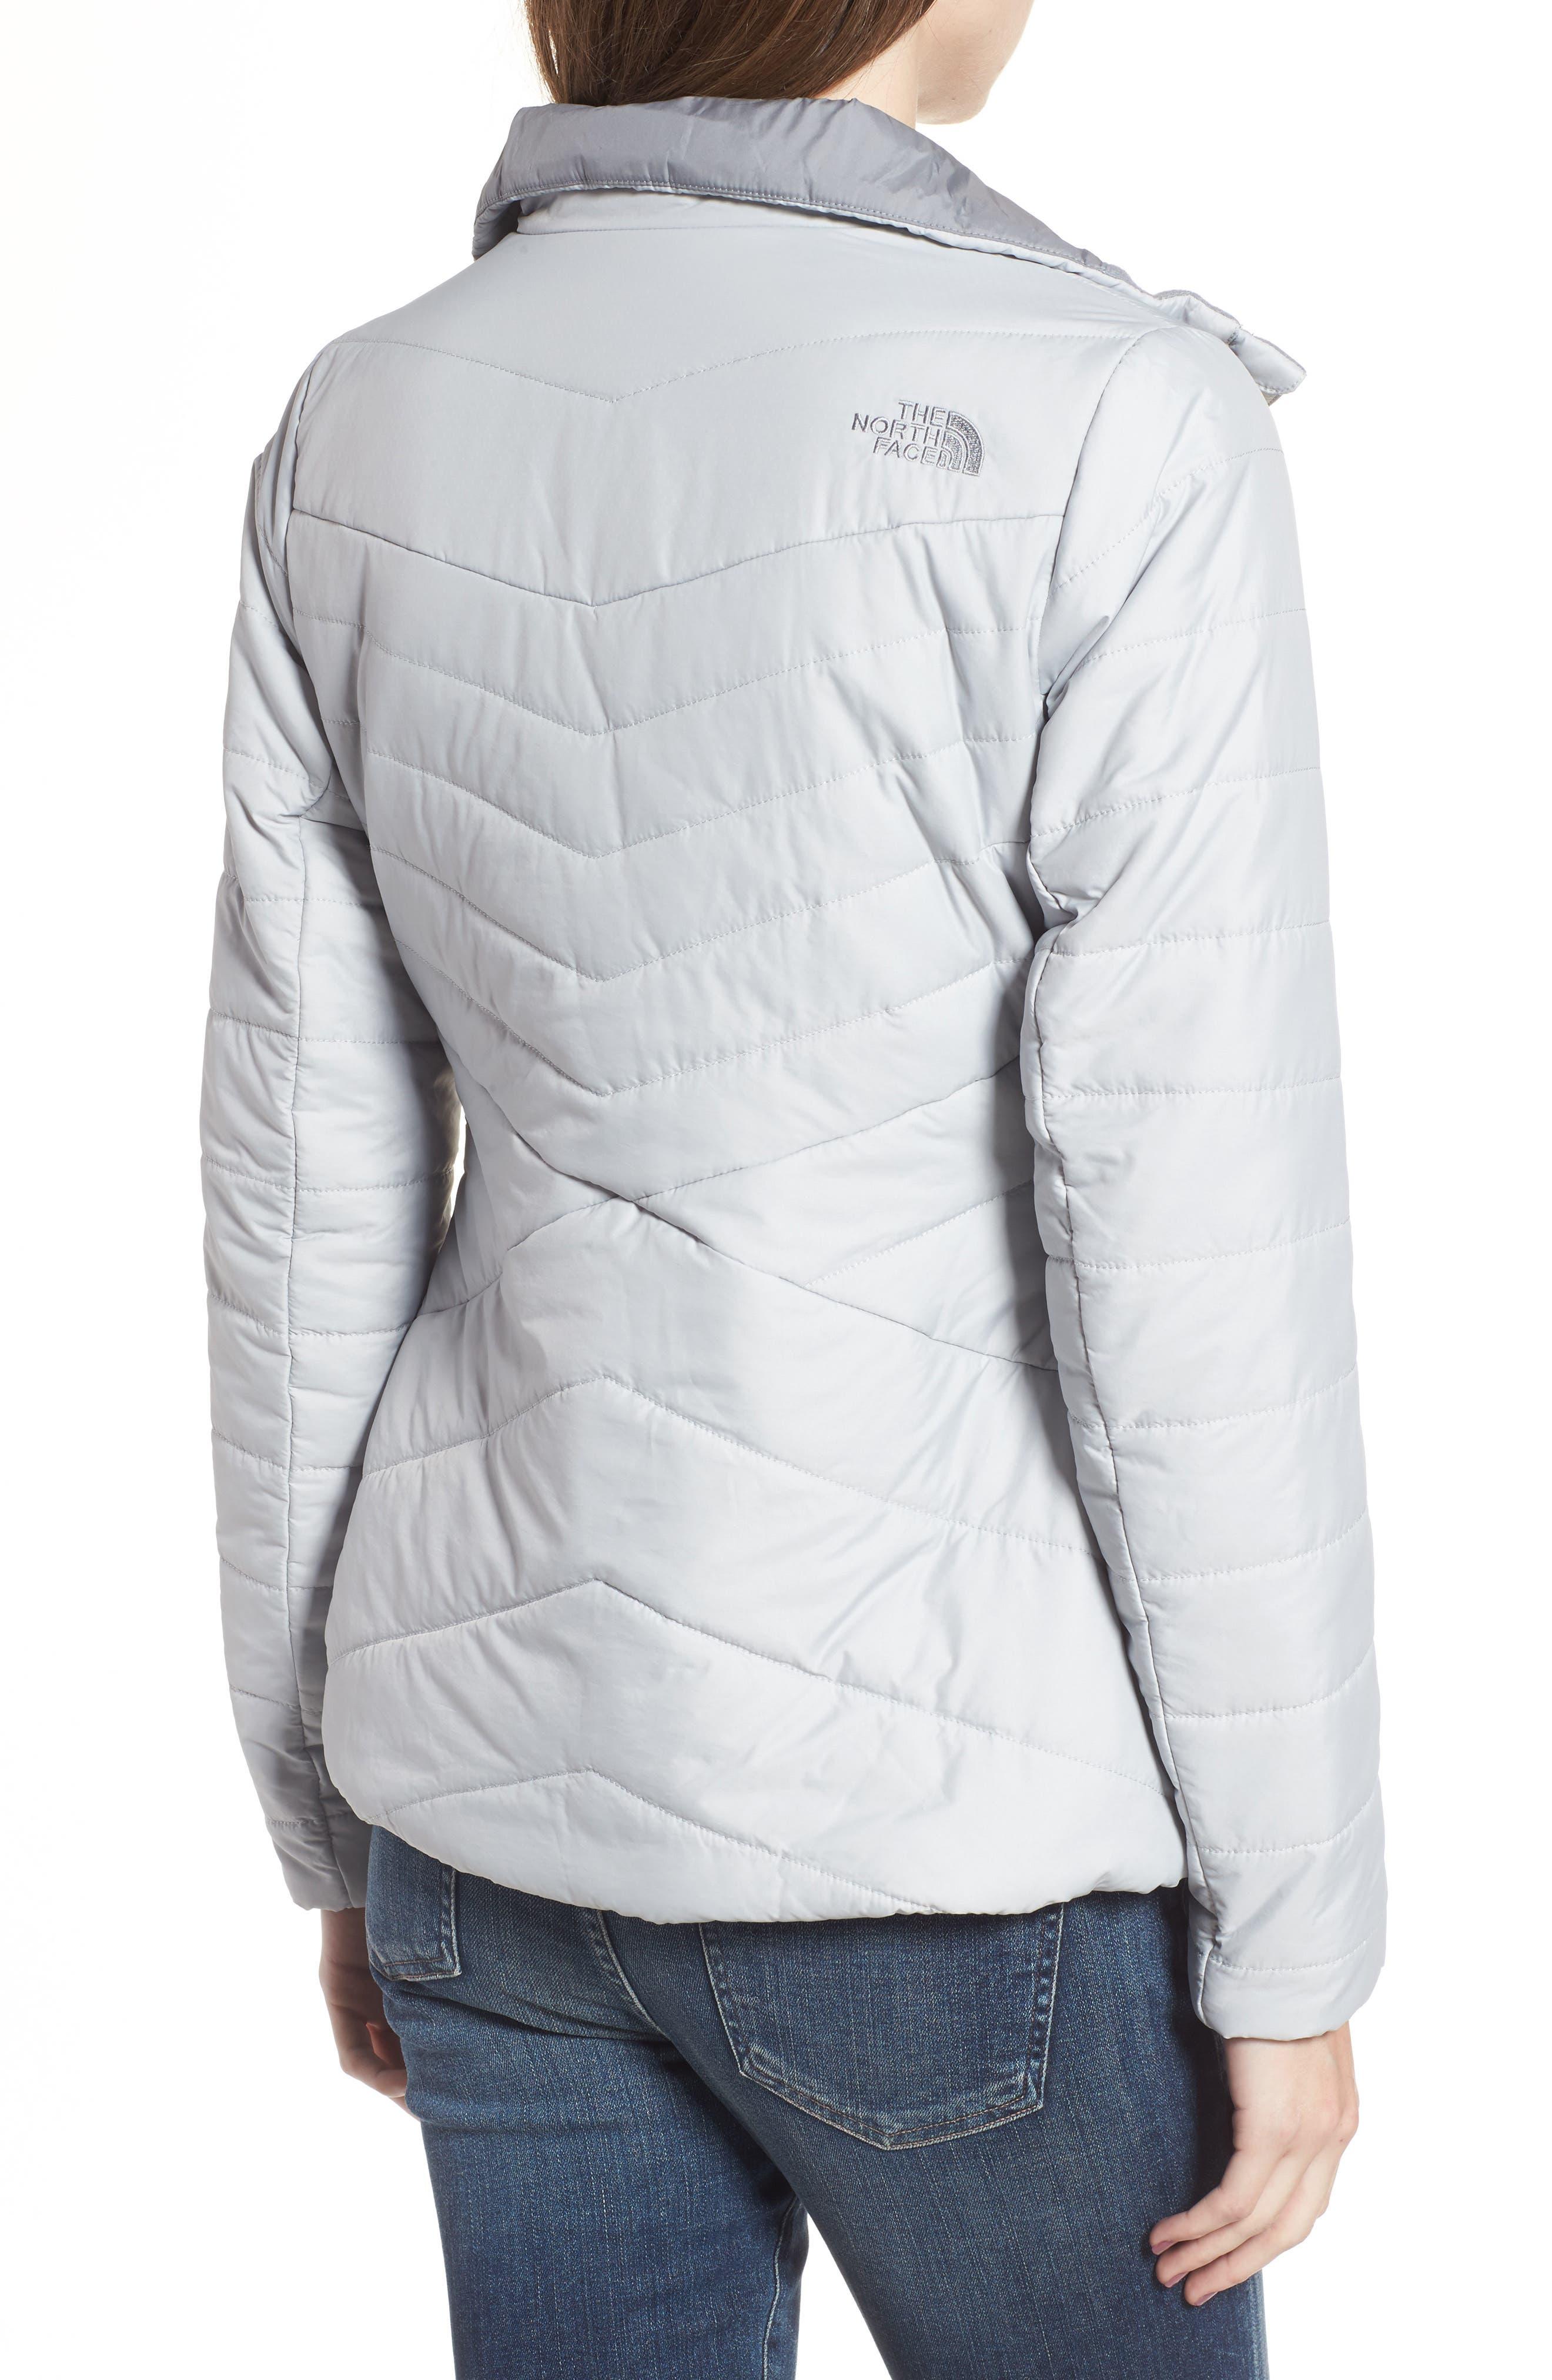 Moonlight Heatseeker Insulated Jacket,                             Alternate thumbnail 6, color,